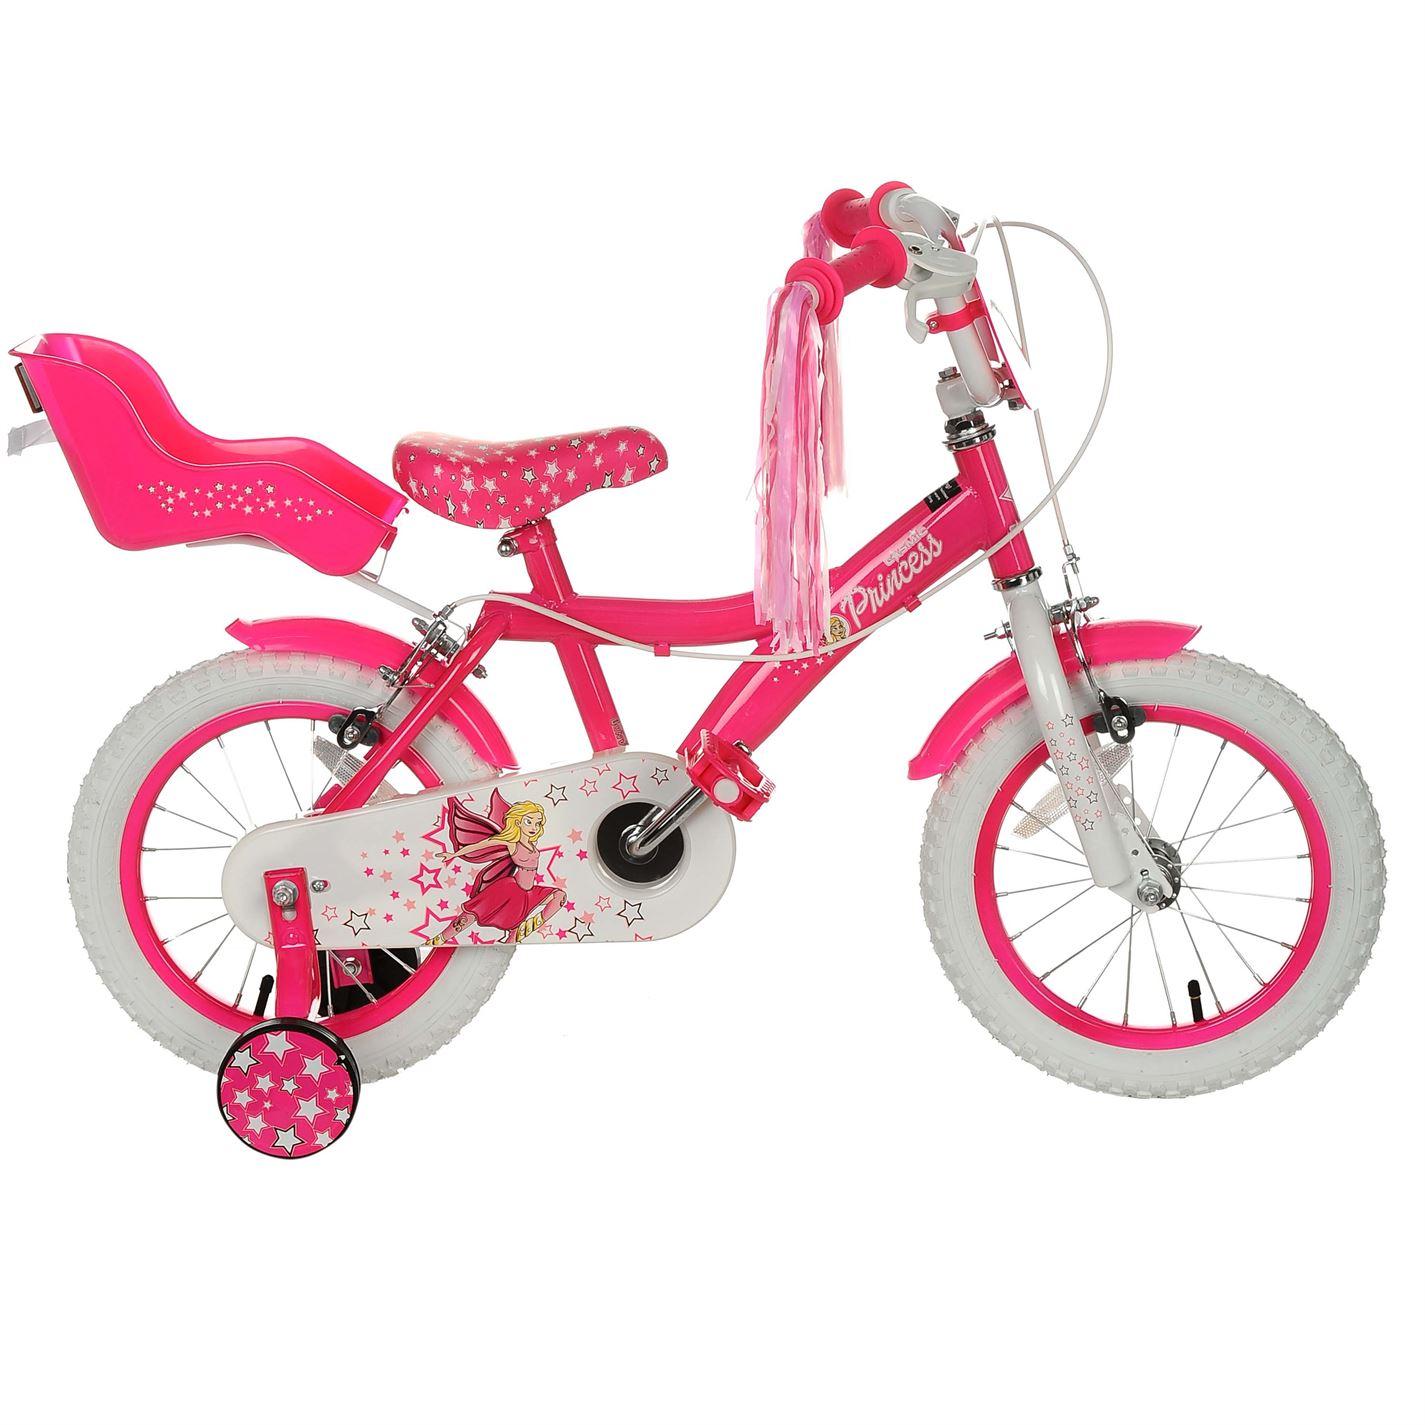 Cosmic Princess 14 Inch Girls Bike